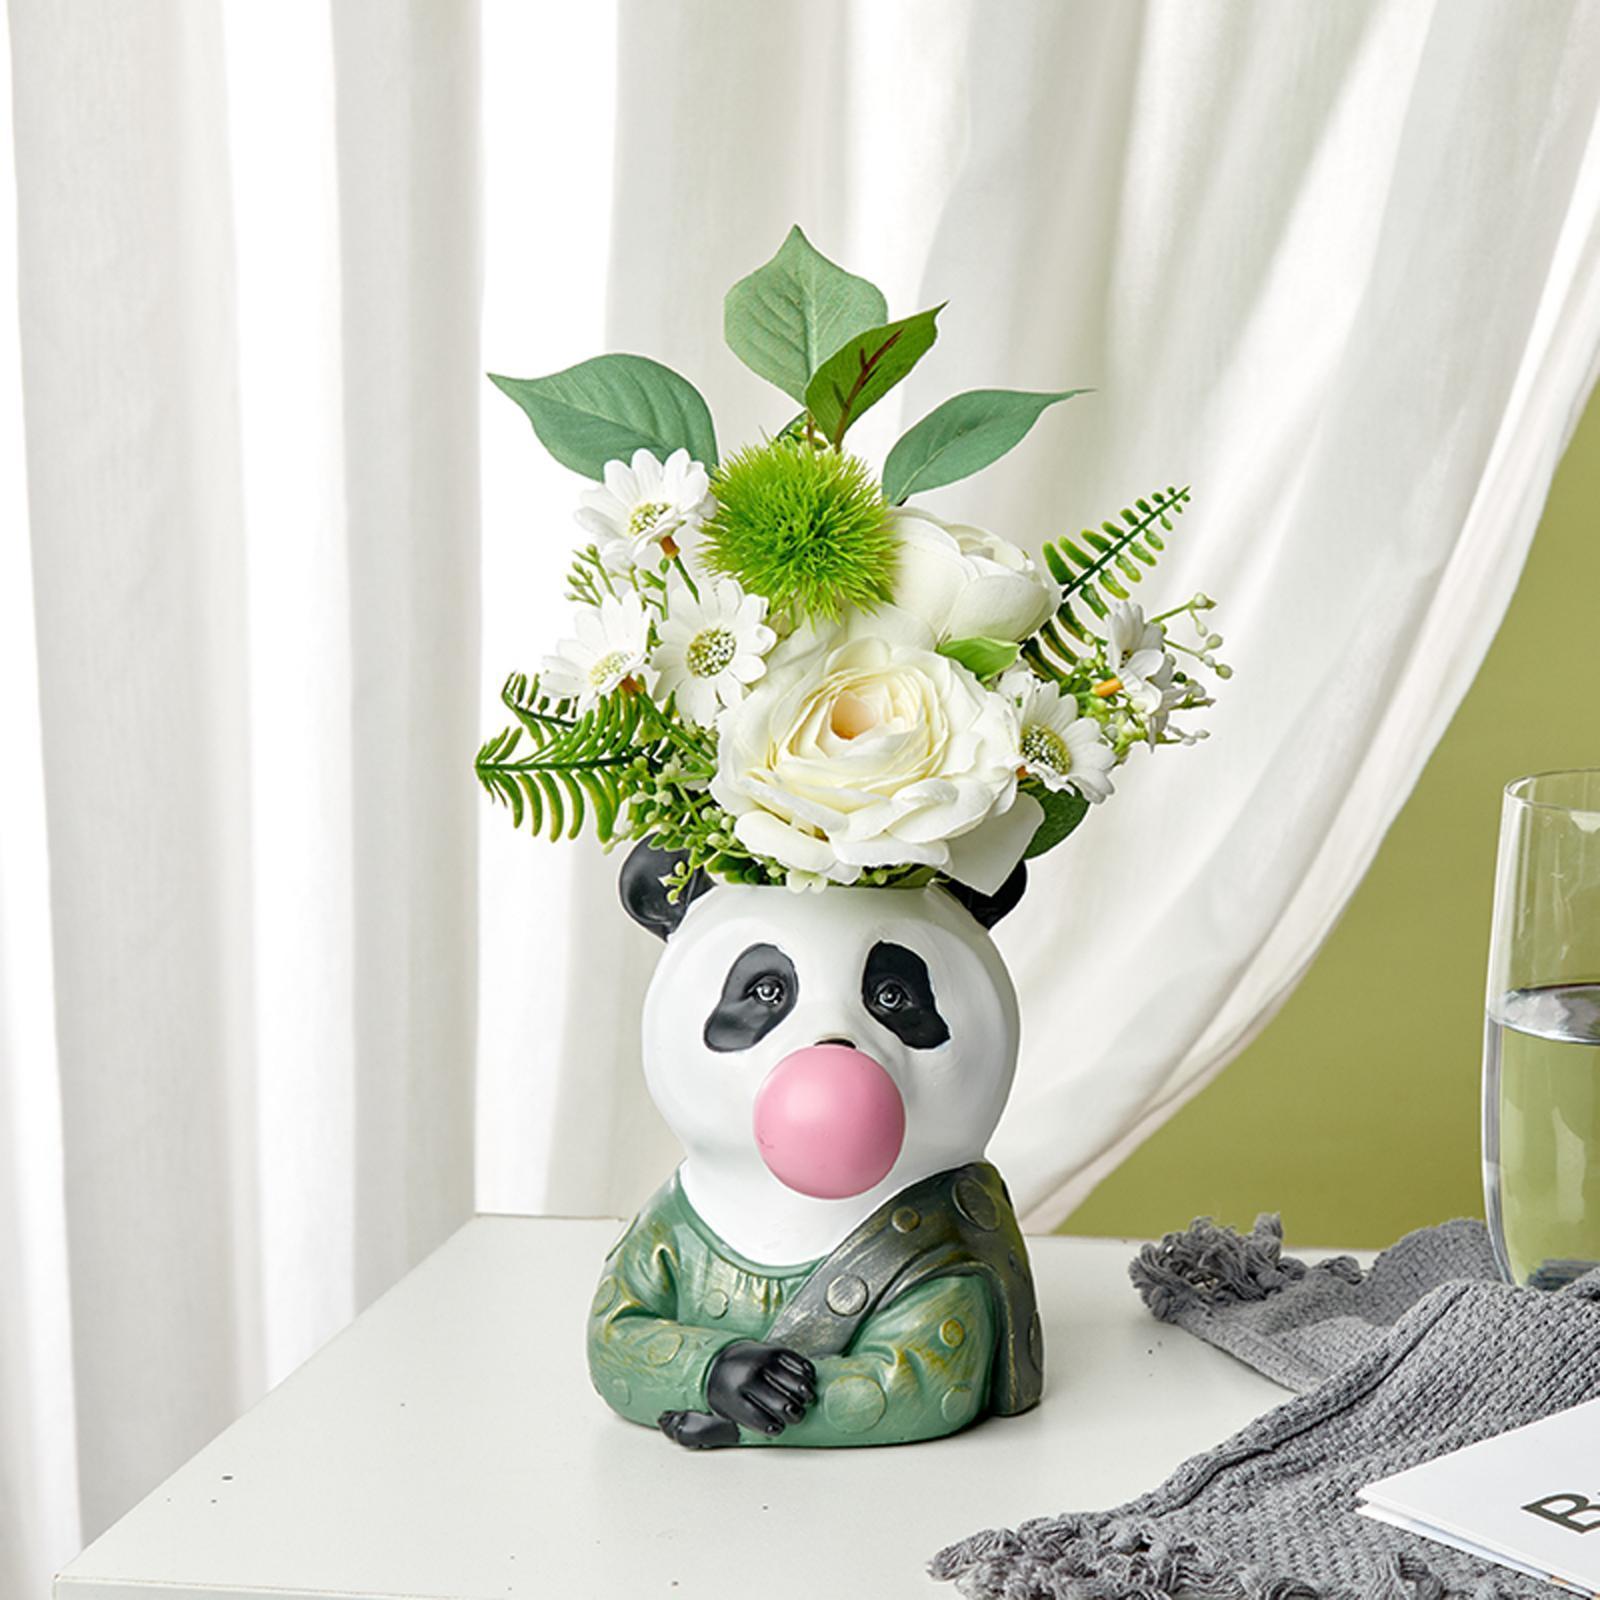 Indexbild 19 - Harz Tierkopf Trockenblume Vase Pflanzer Topf Home Office Bar Desktop Ornament